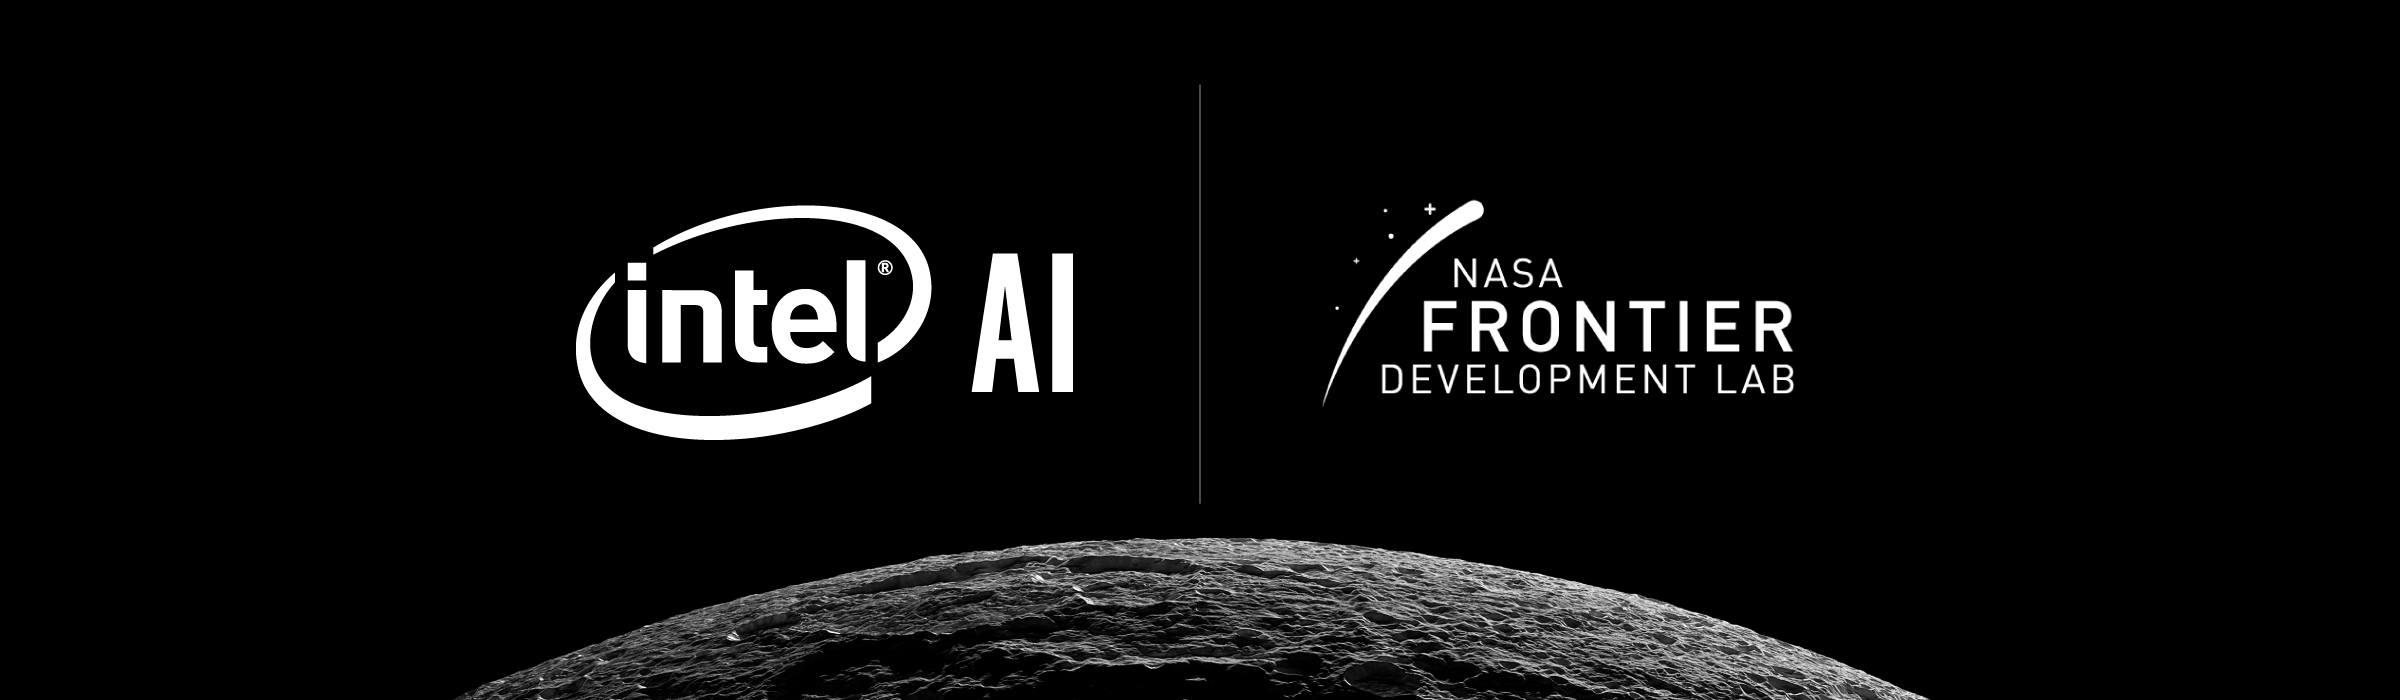 NASA_FDL_2_HI.jpg